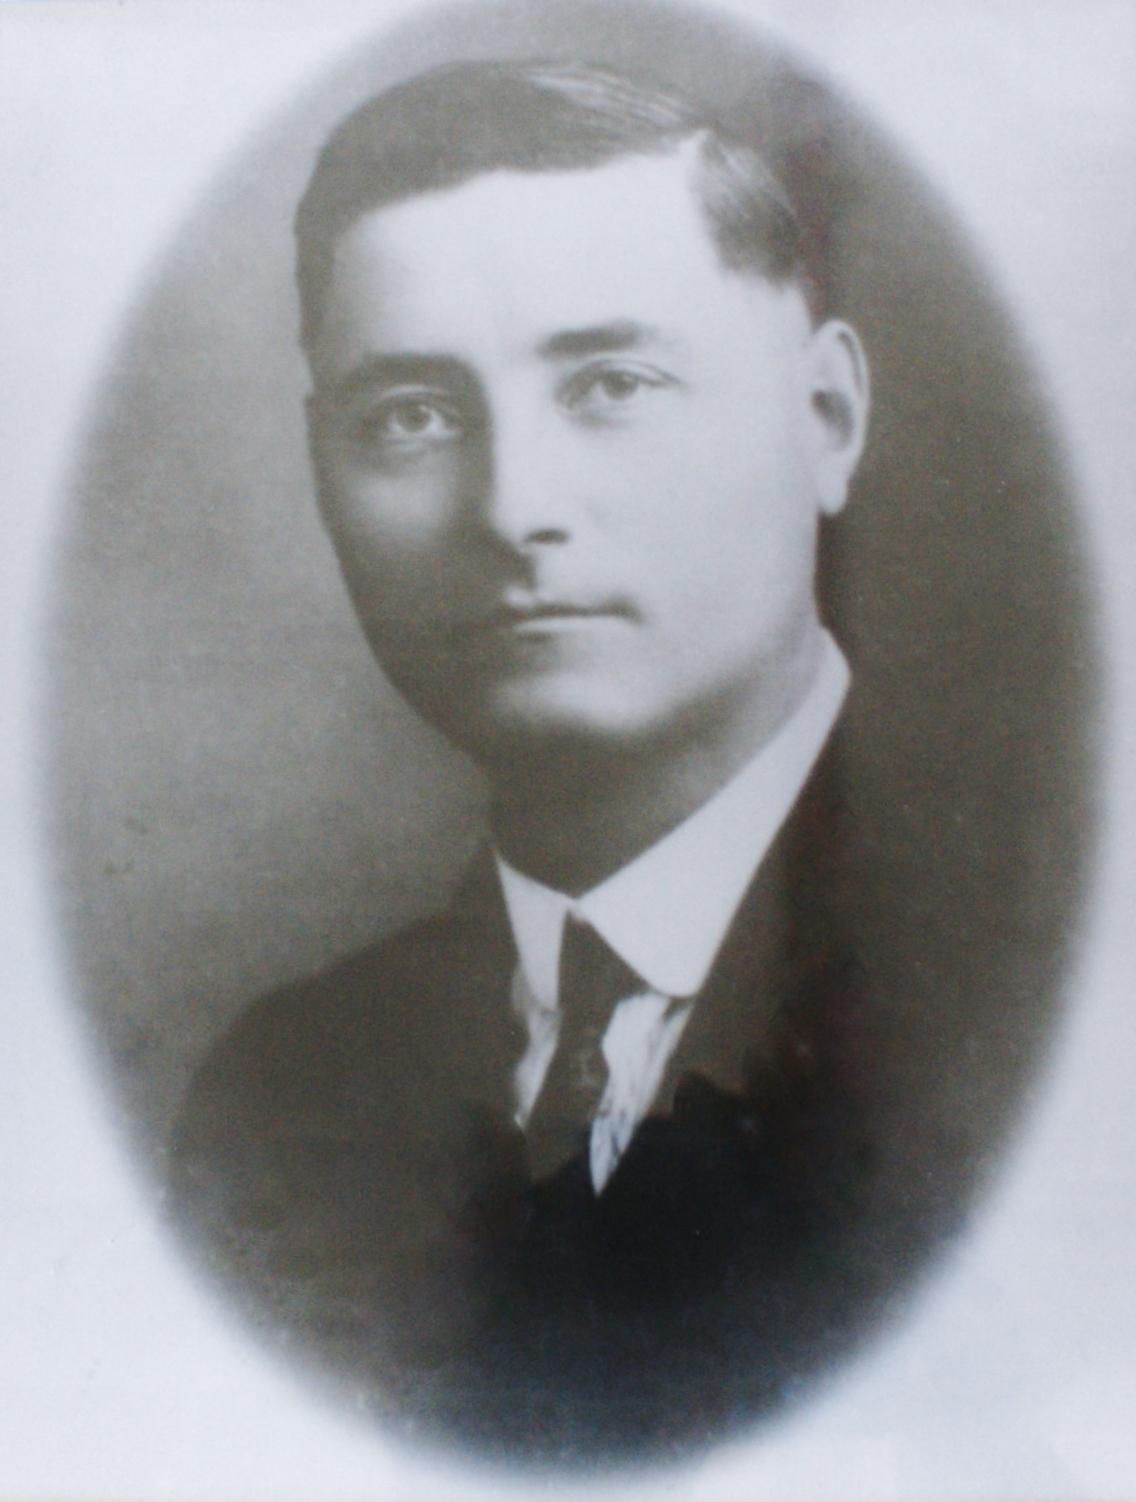 G.B. Airhart, Secretary-Treasurerof the Marmora Herald Printing Co. Ltd.